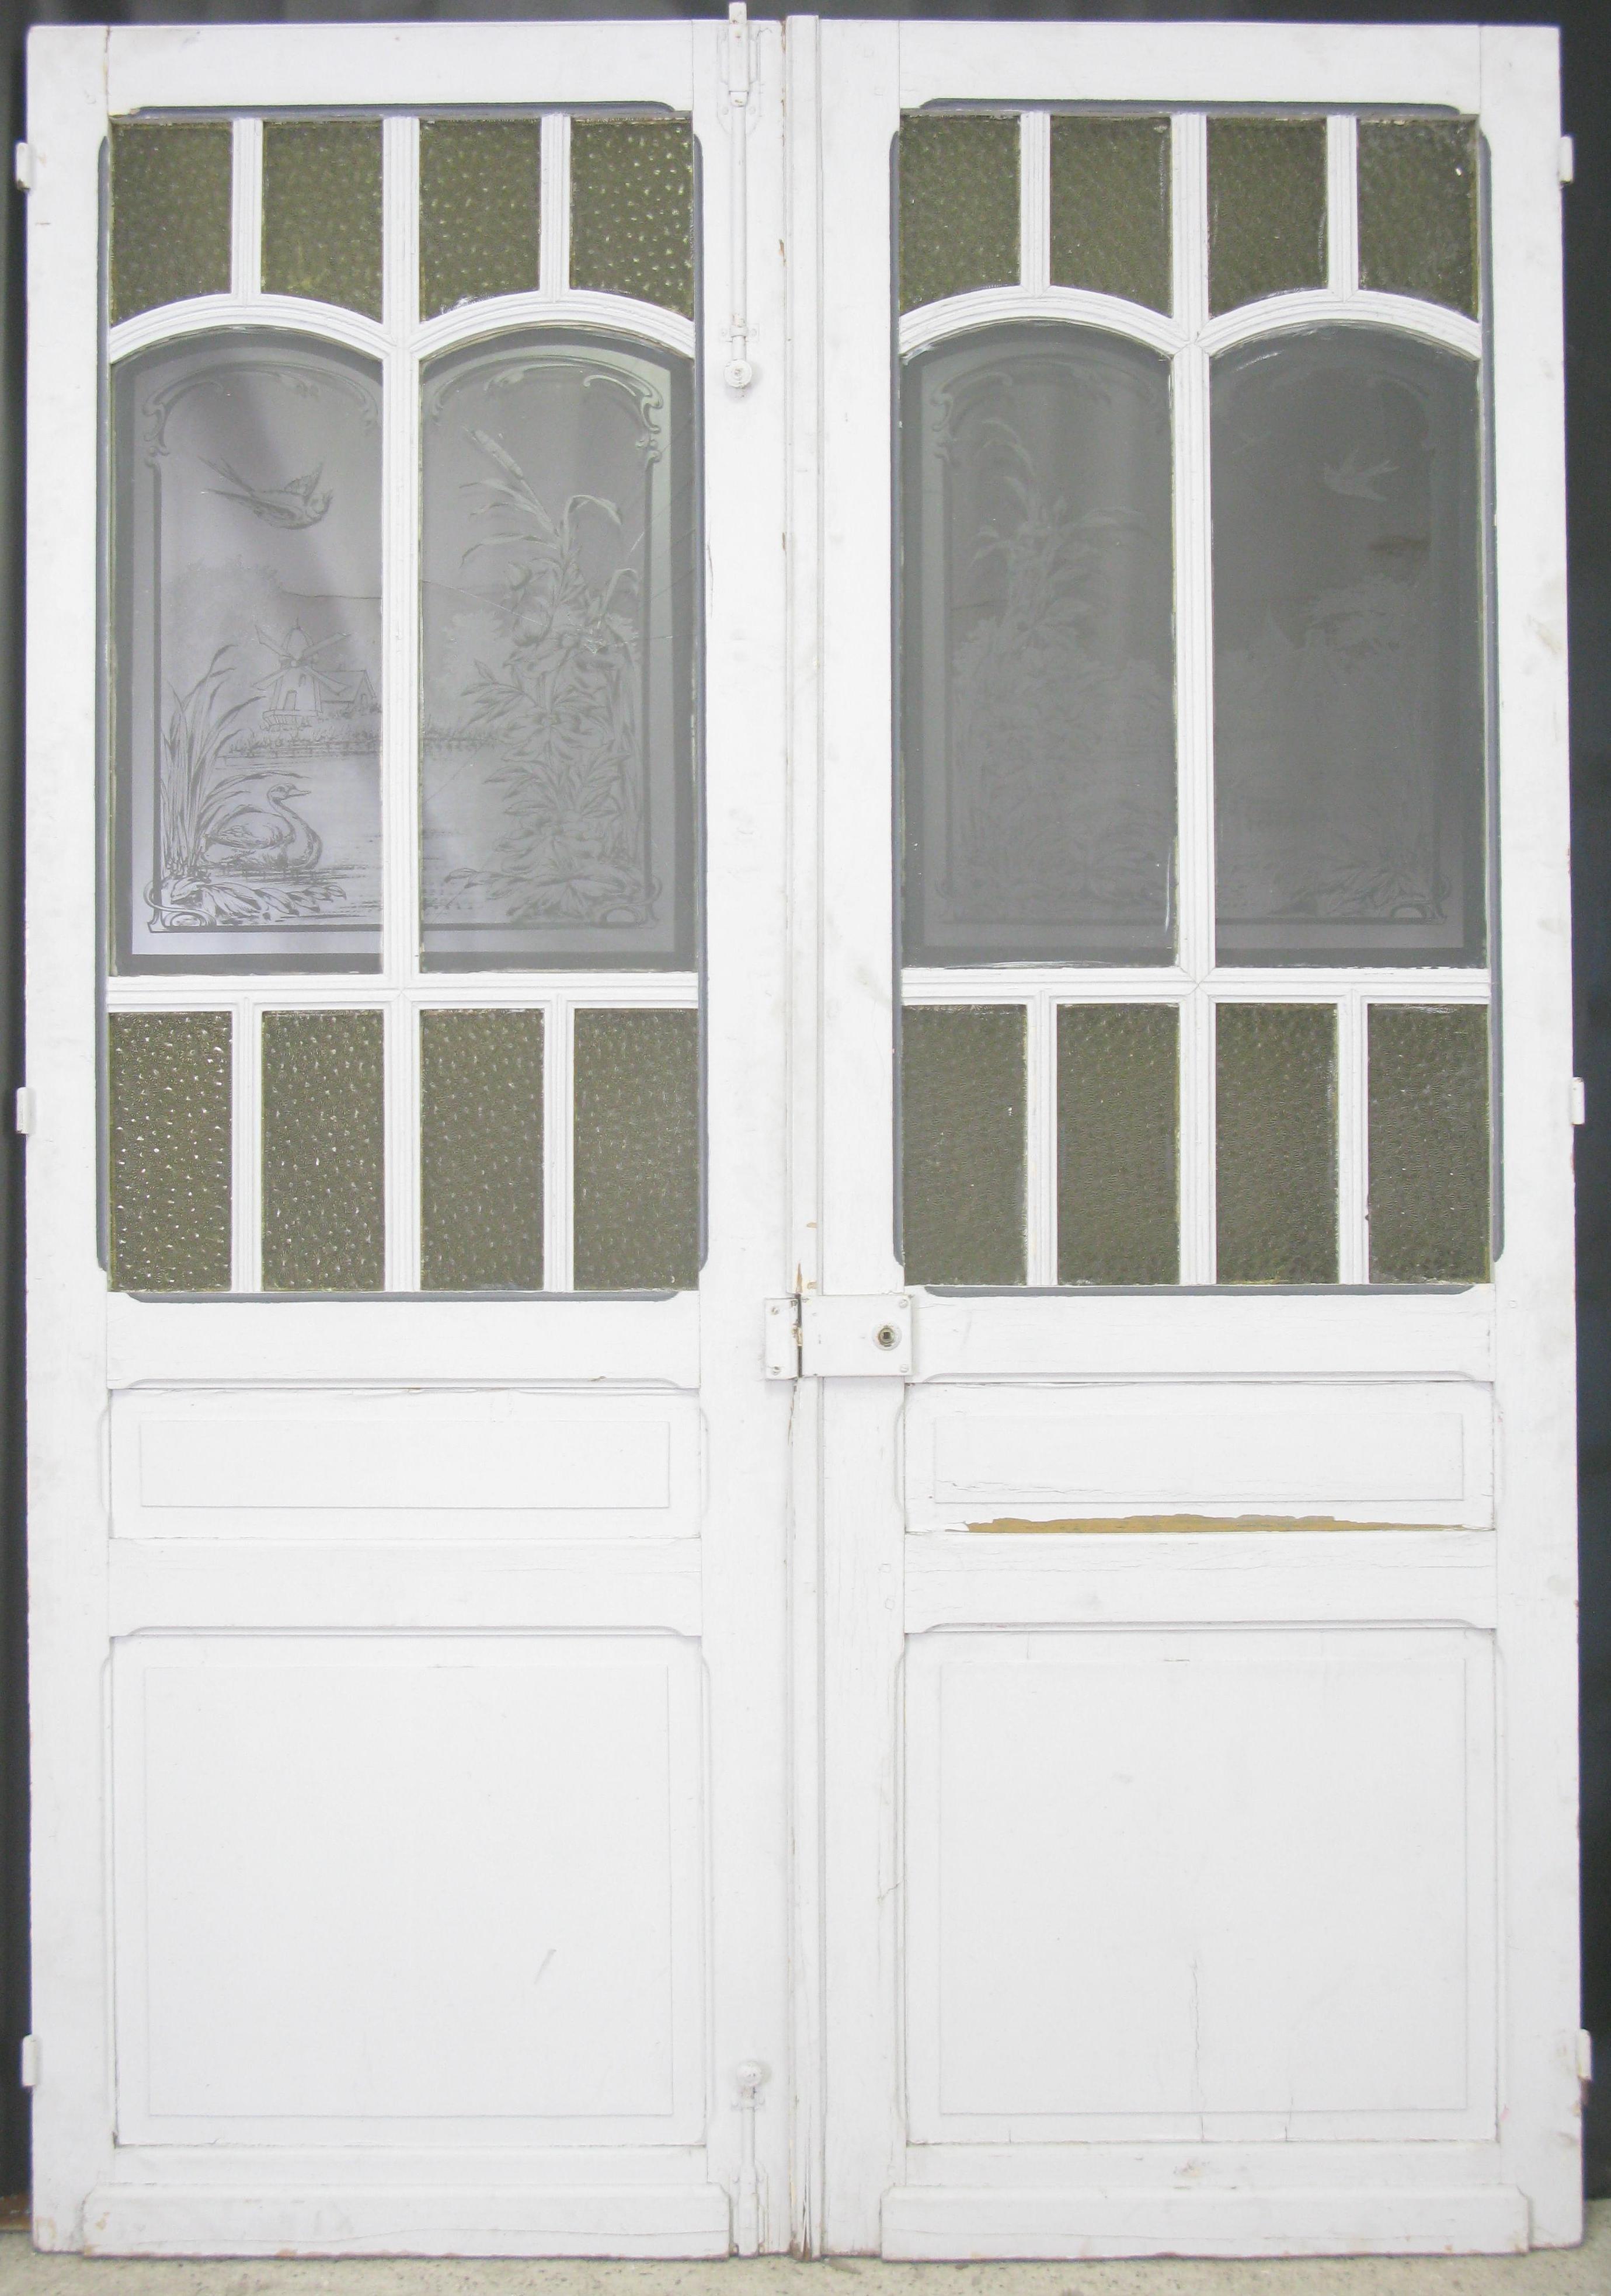 zimmert ren online bestellen zimmert ren mit zarge kaufen. Black Bedroom Furniture Sets. Home Design Ideas